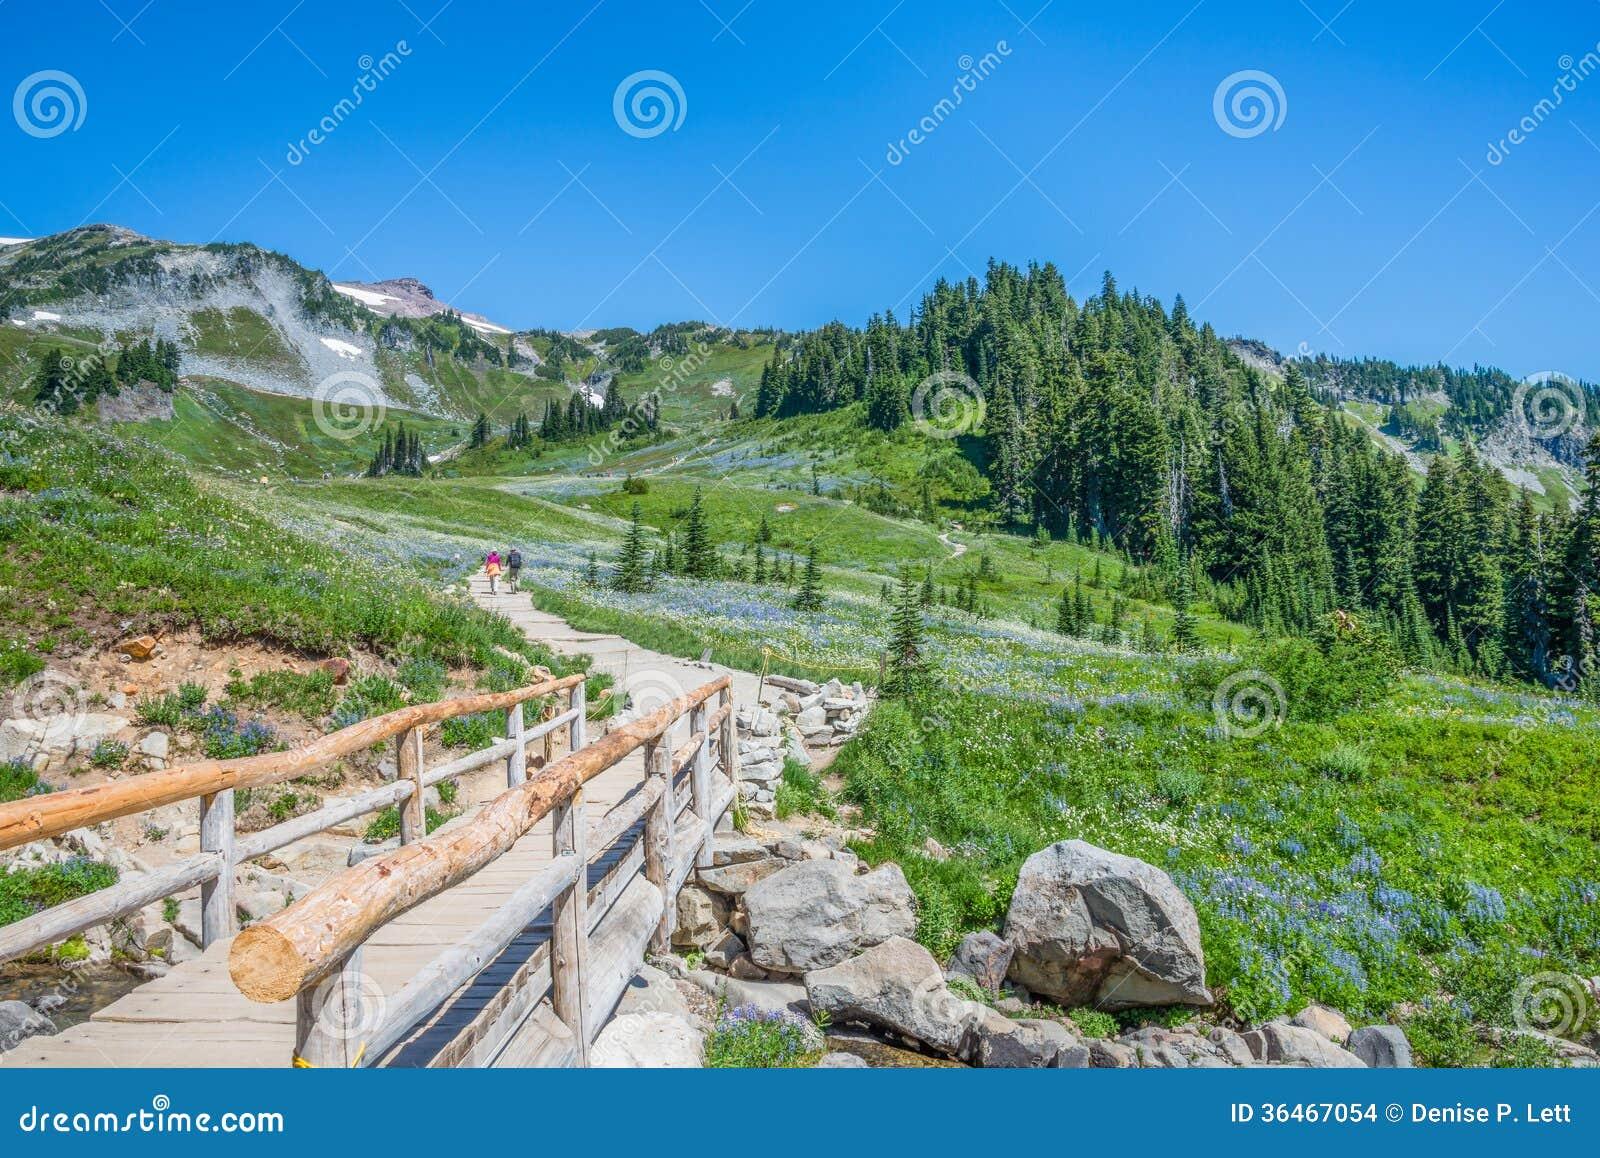 Washington State Travel Id